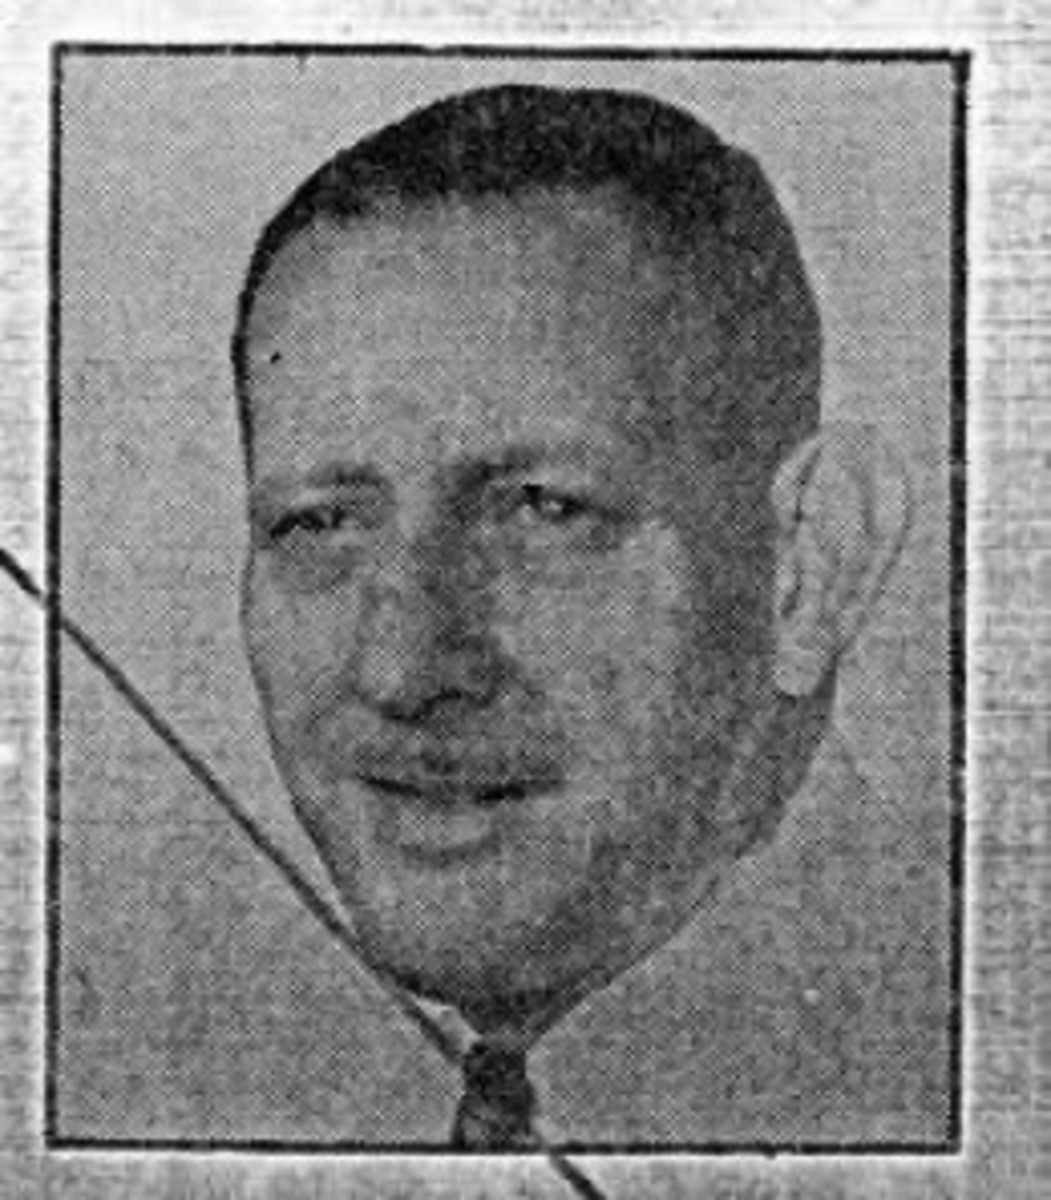 Morley Vernon King